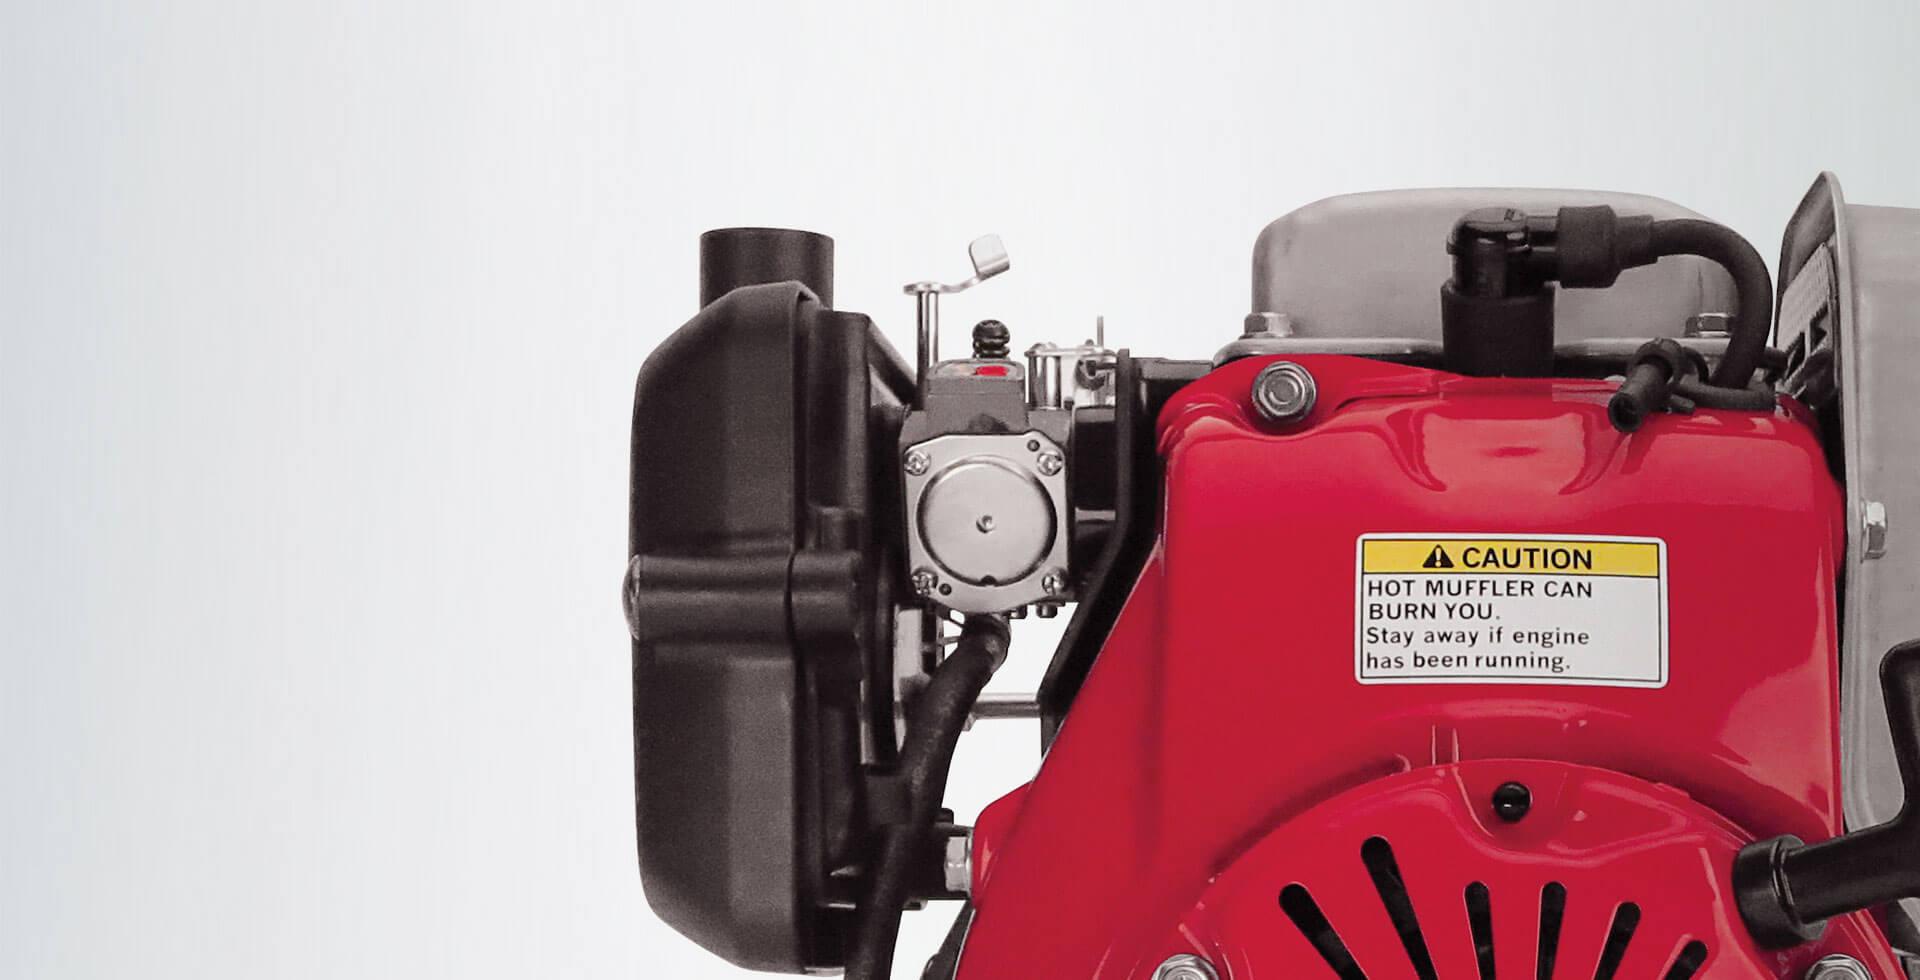 MOTOR 4,0HP  ESTACIONARIO HONDA  P/ COMPACTADOR DE SOLO GXR120 - GXR120RTKRA2